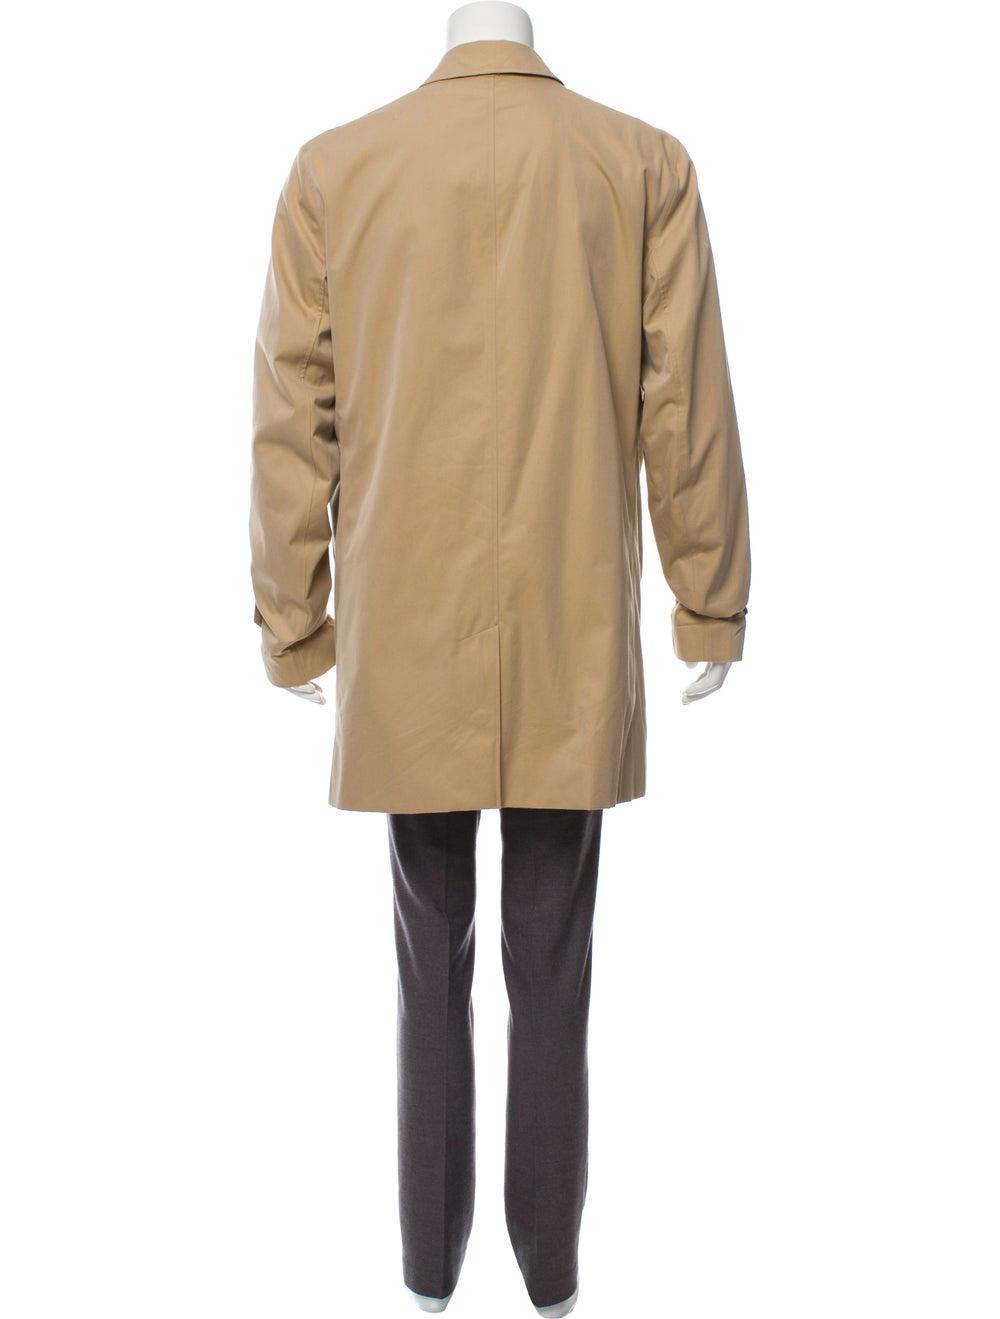 Burberry Nova Check Trench Coat beige - image 3